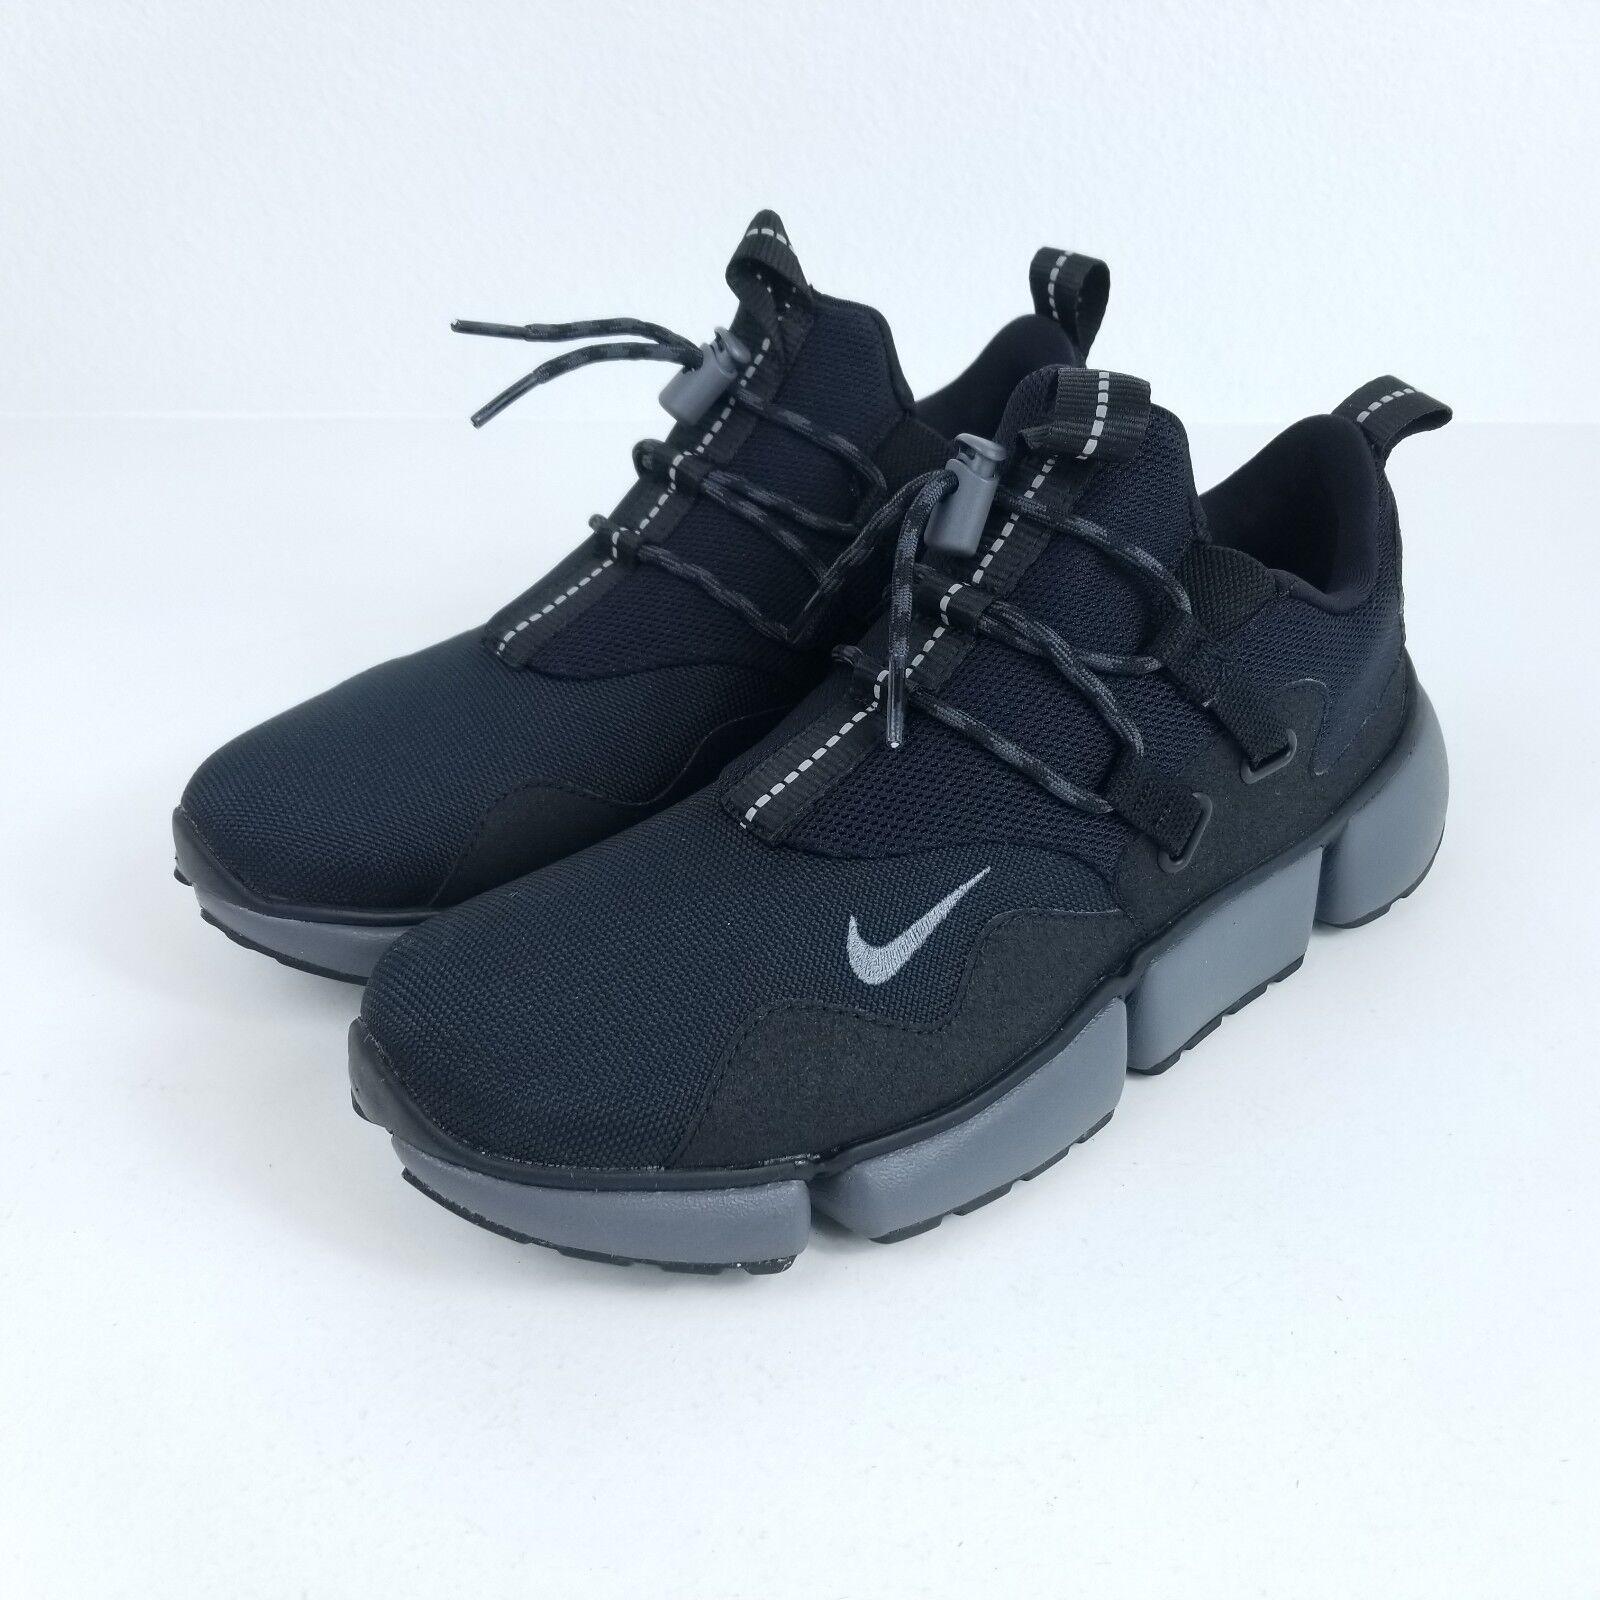 Nike navaja de bolsillo gris DM hombre sz 9,5 zapatos gris bolsillo negro 58617b